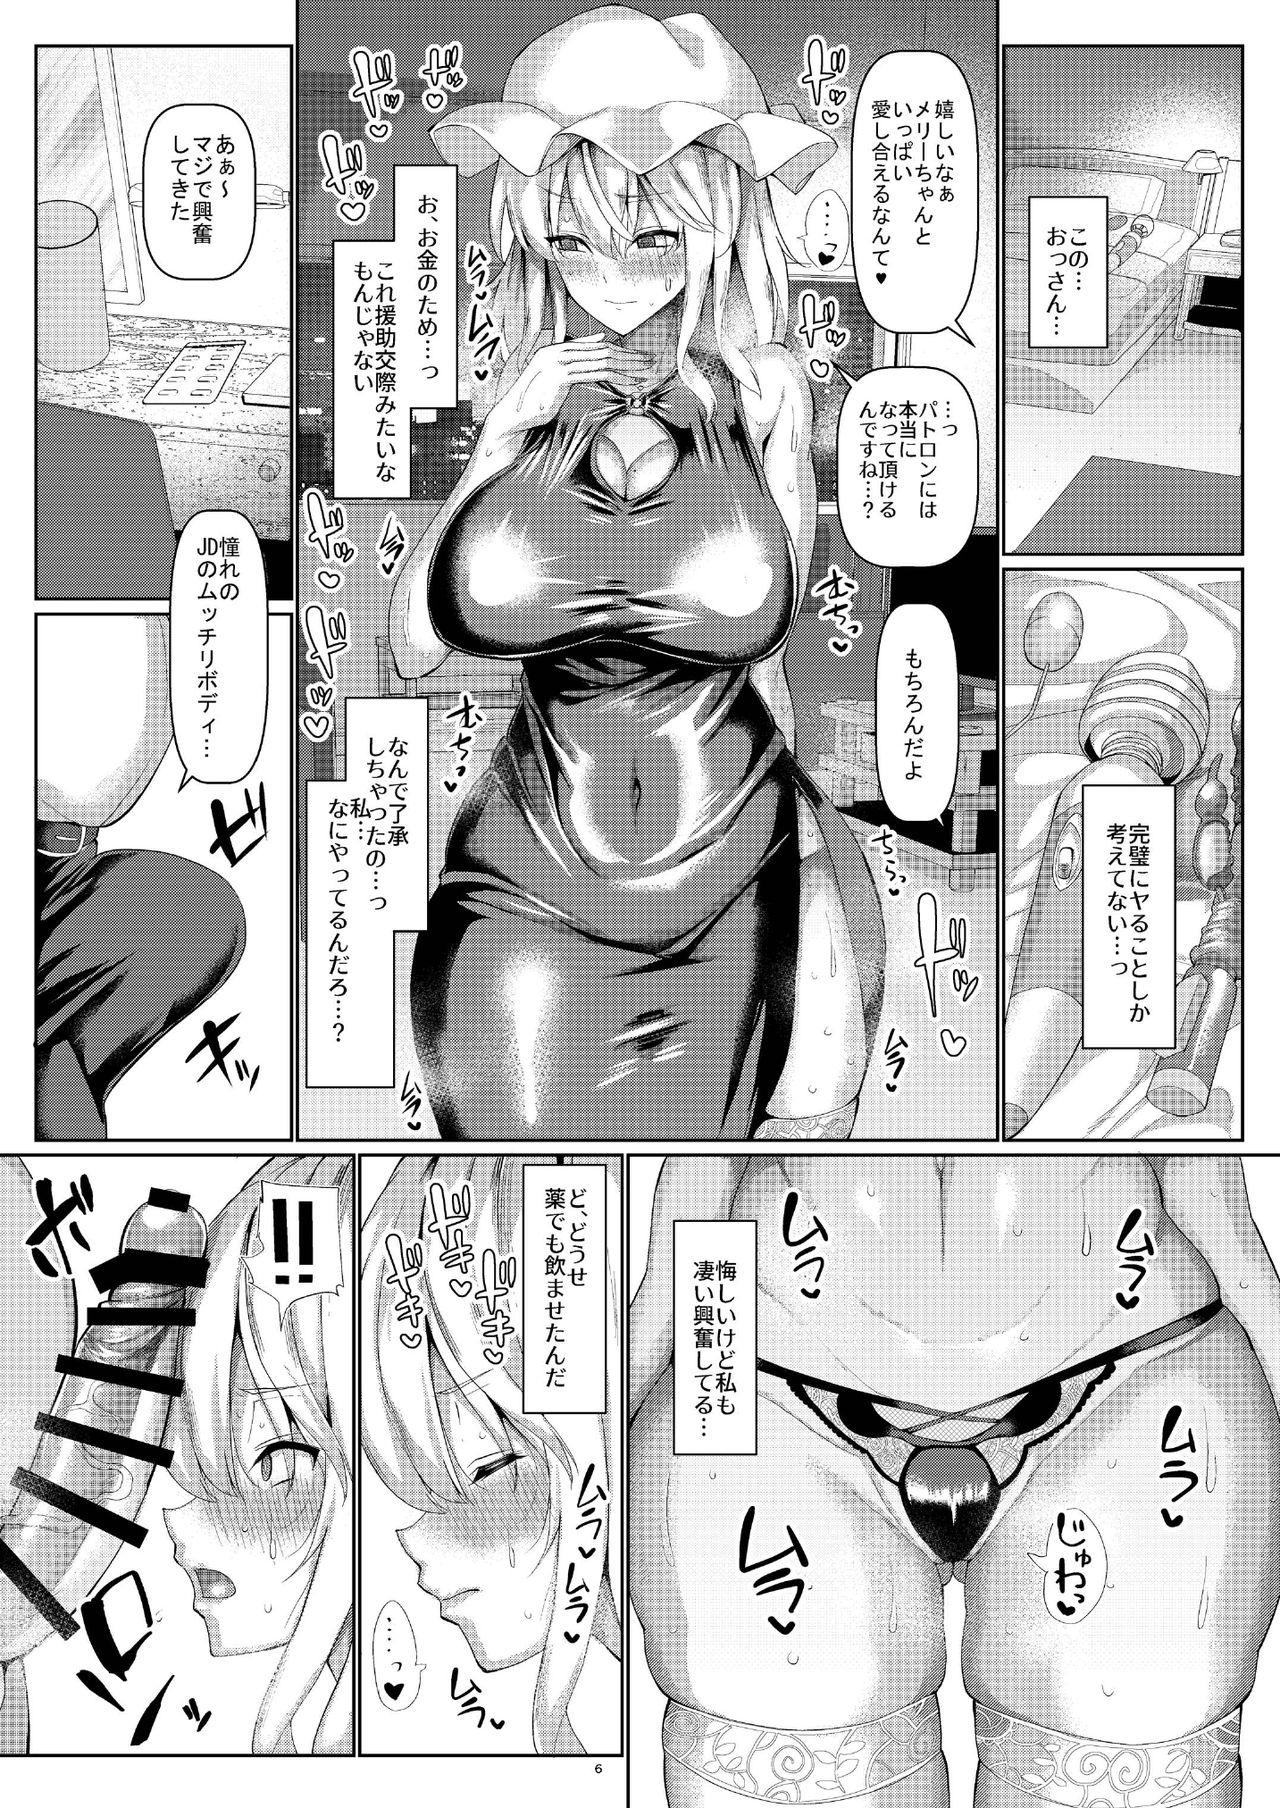 BodyCon Merry no Ogehin Koubi 7